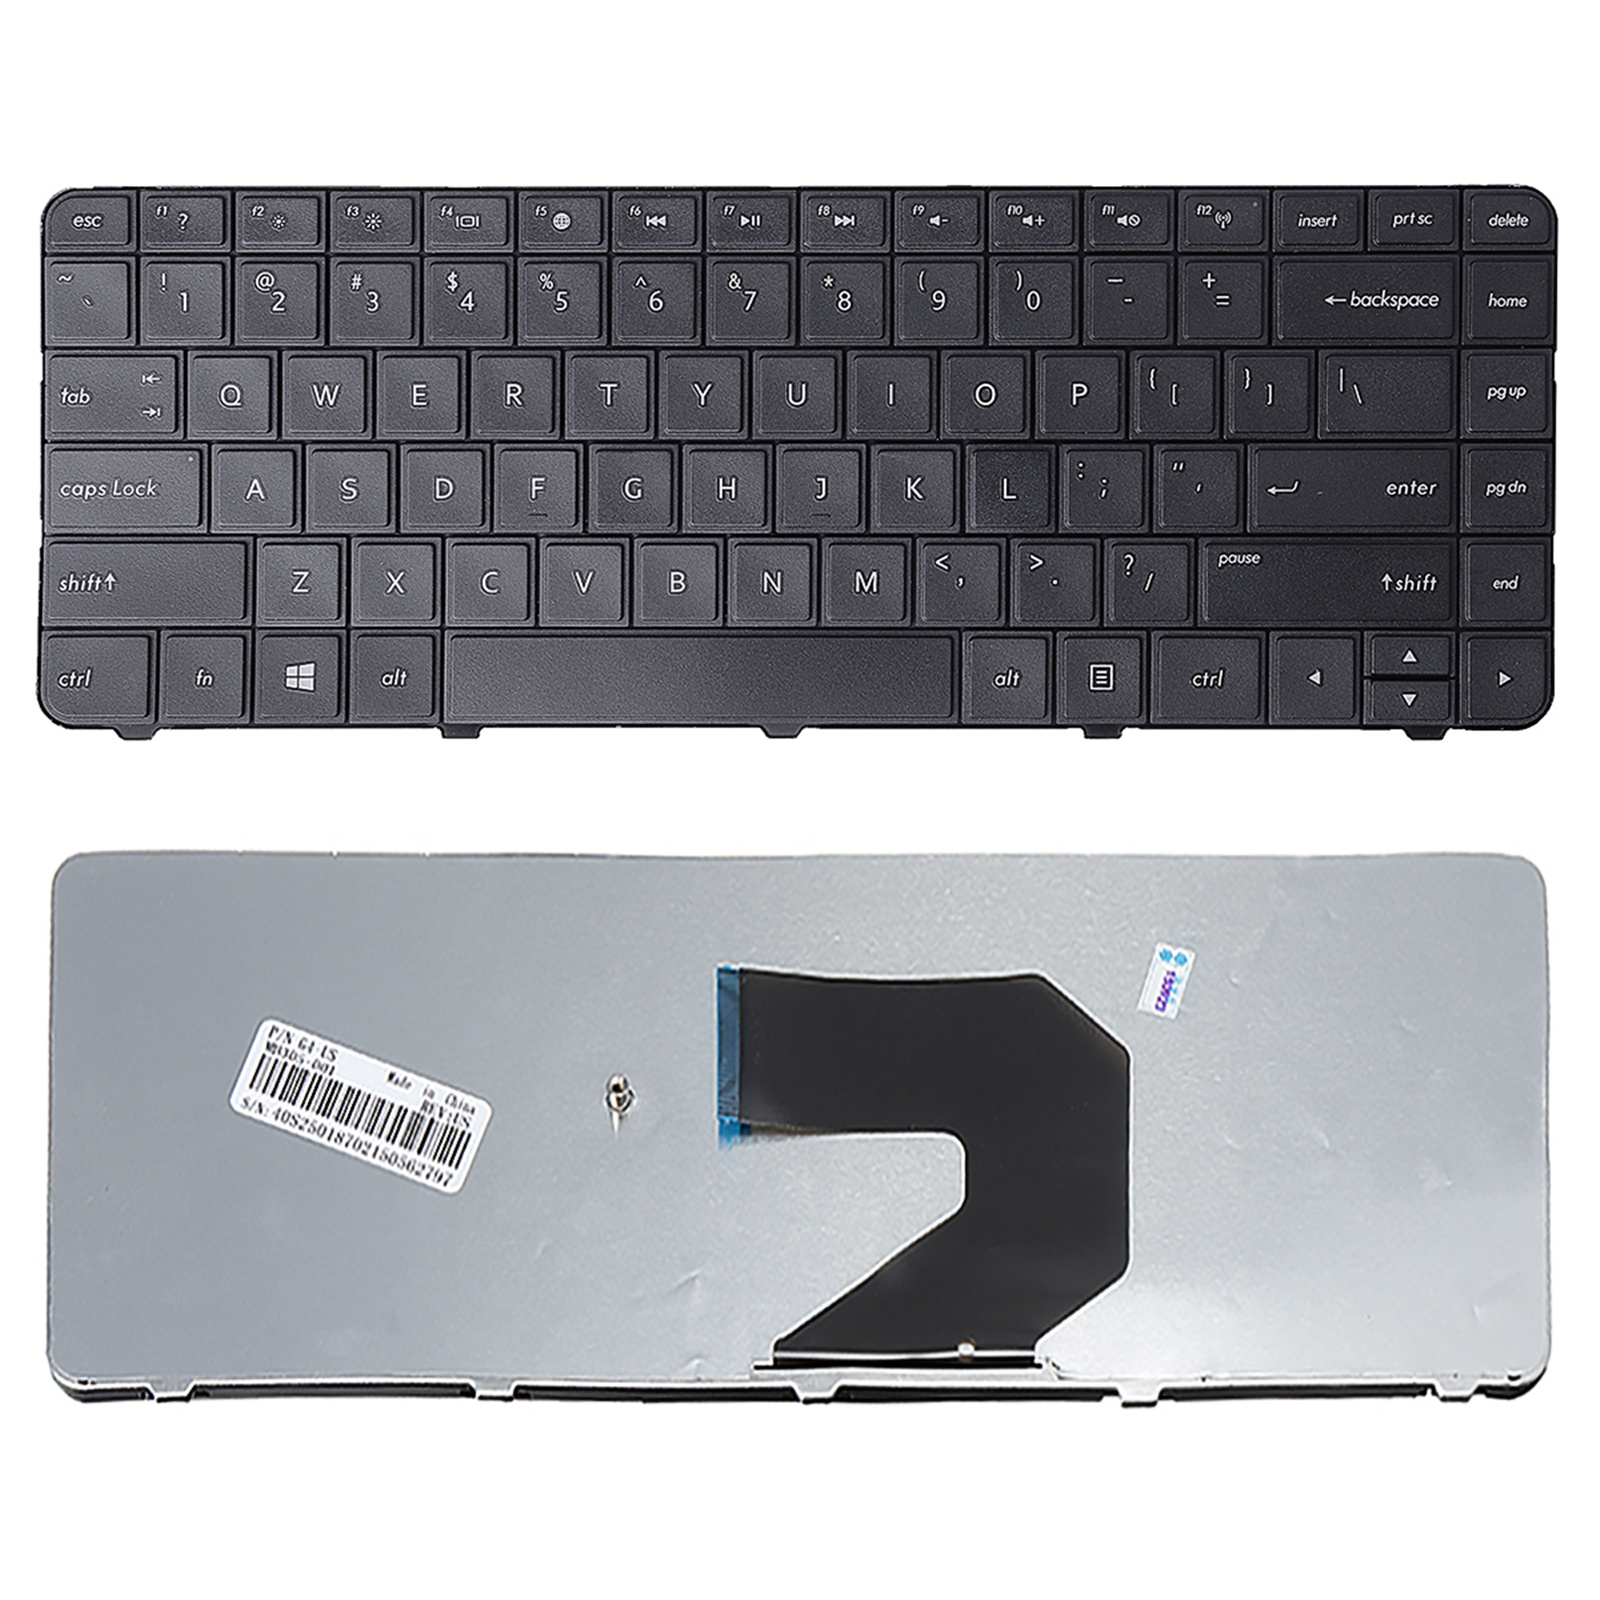 HP keyboard HPG6 black 636376-001 B